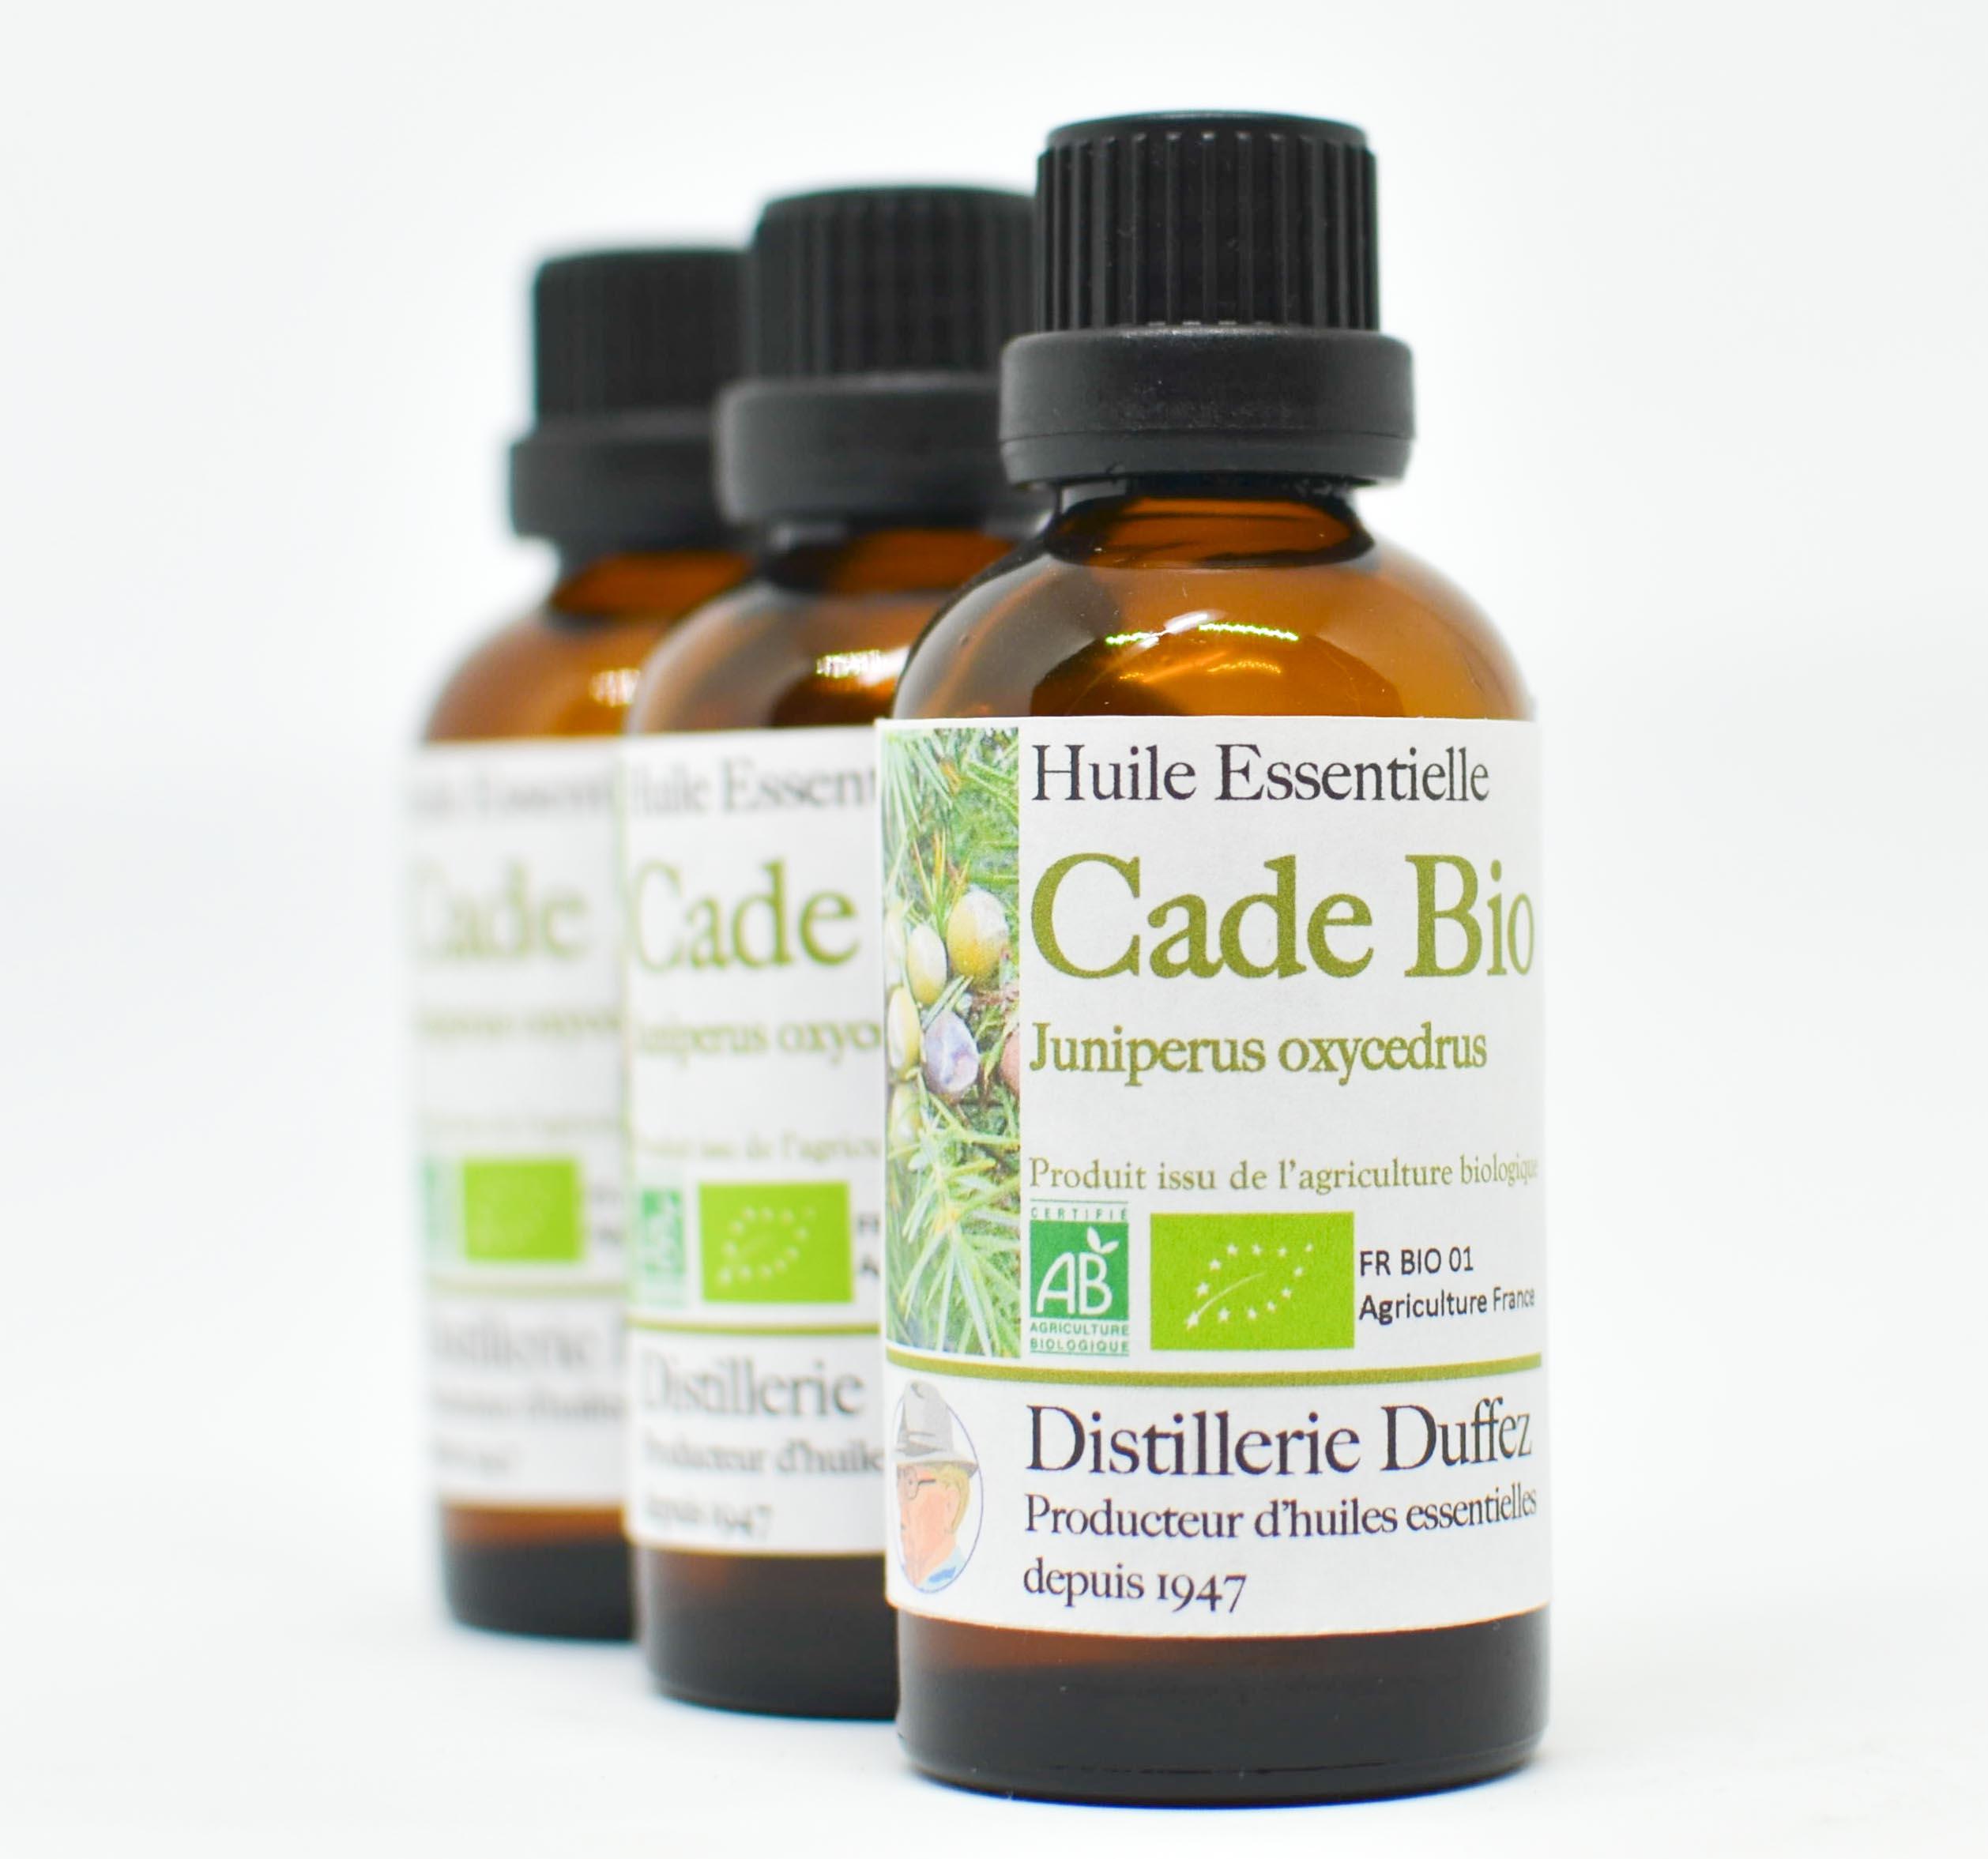 huile essentielle de cade bio distillerie duffez. Black Bedroom Furniture Sets. Home Design Ideas